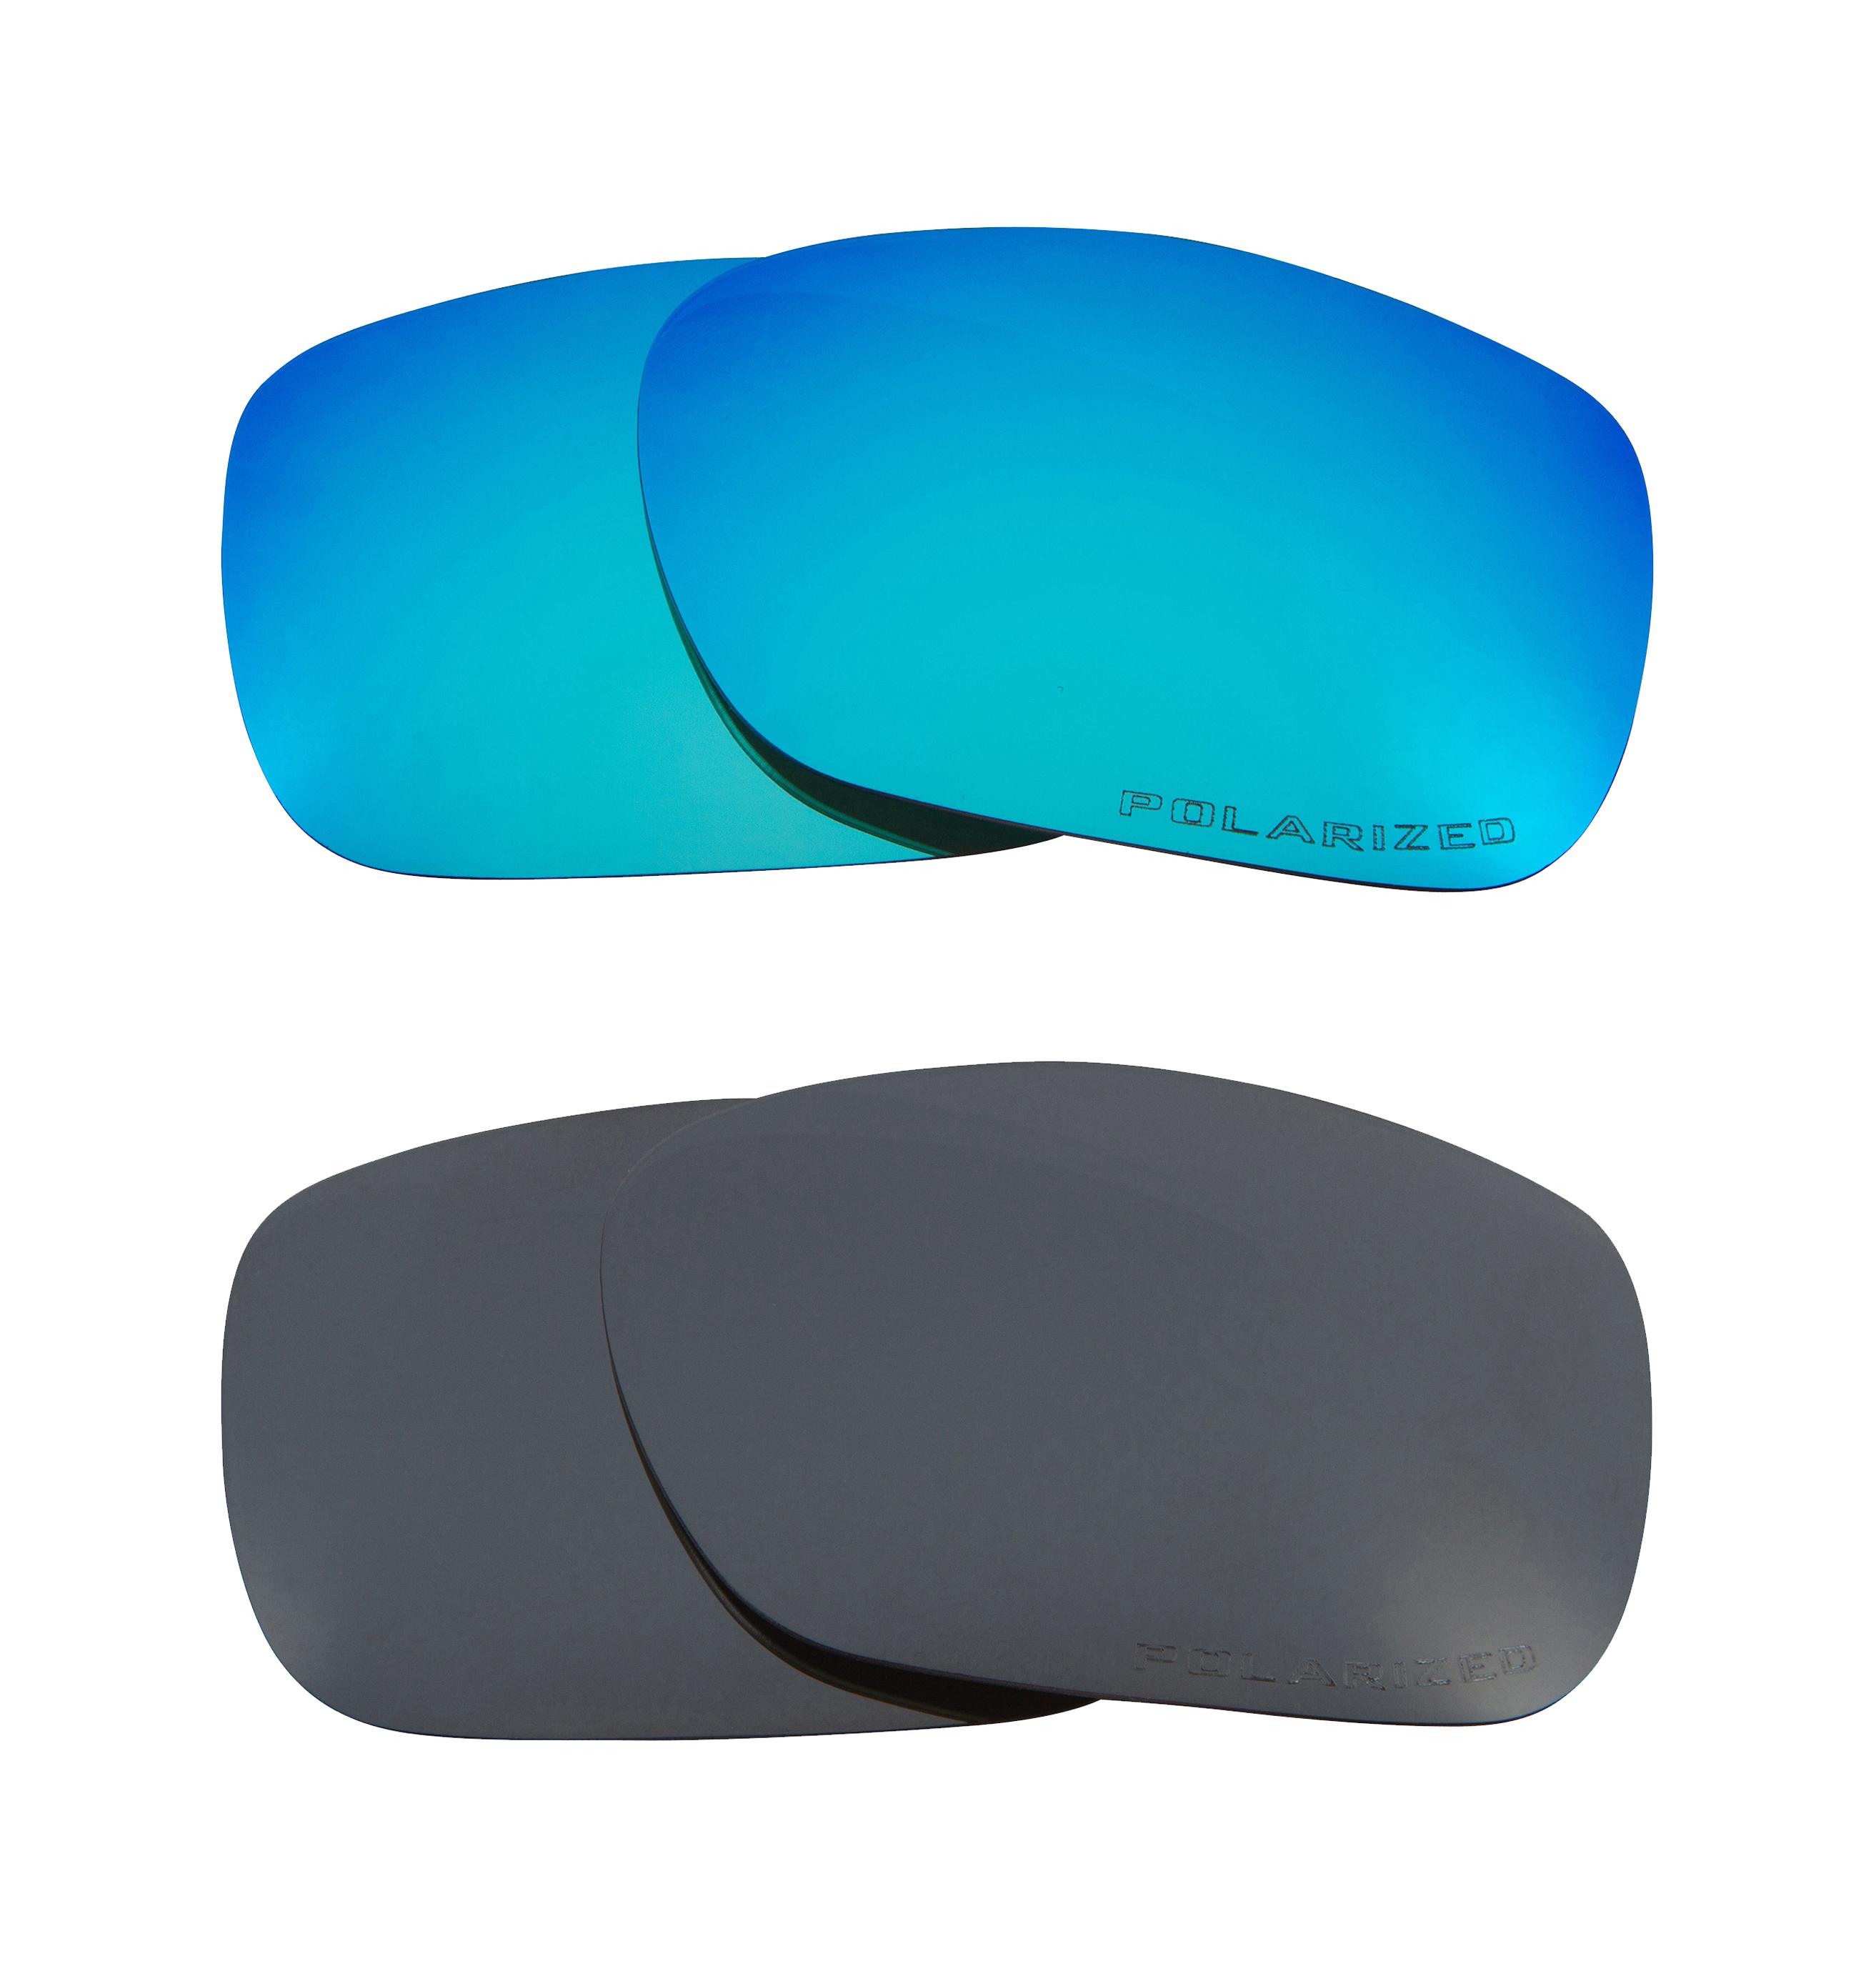 20d5e42c61 TWOFACE Replacement Lenses Polarized Blue   Black Iridium by SEEK fits  OAKLEY